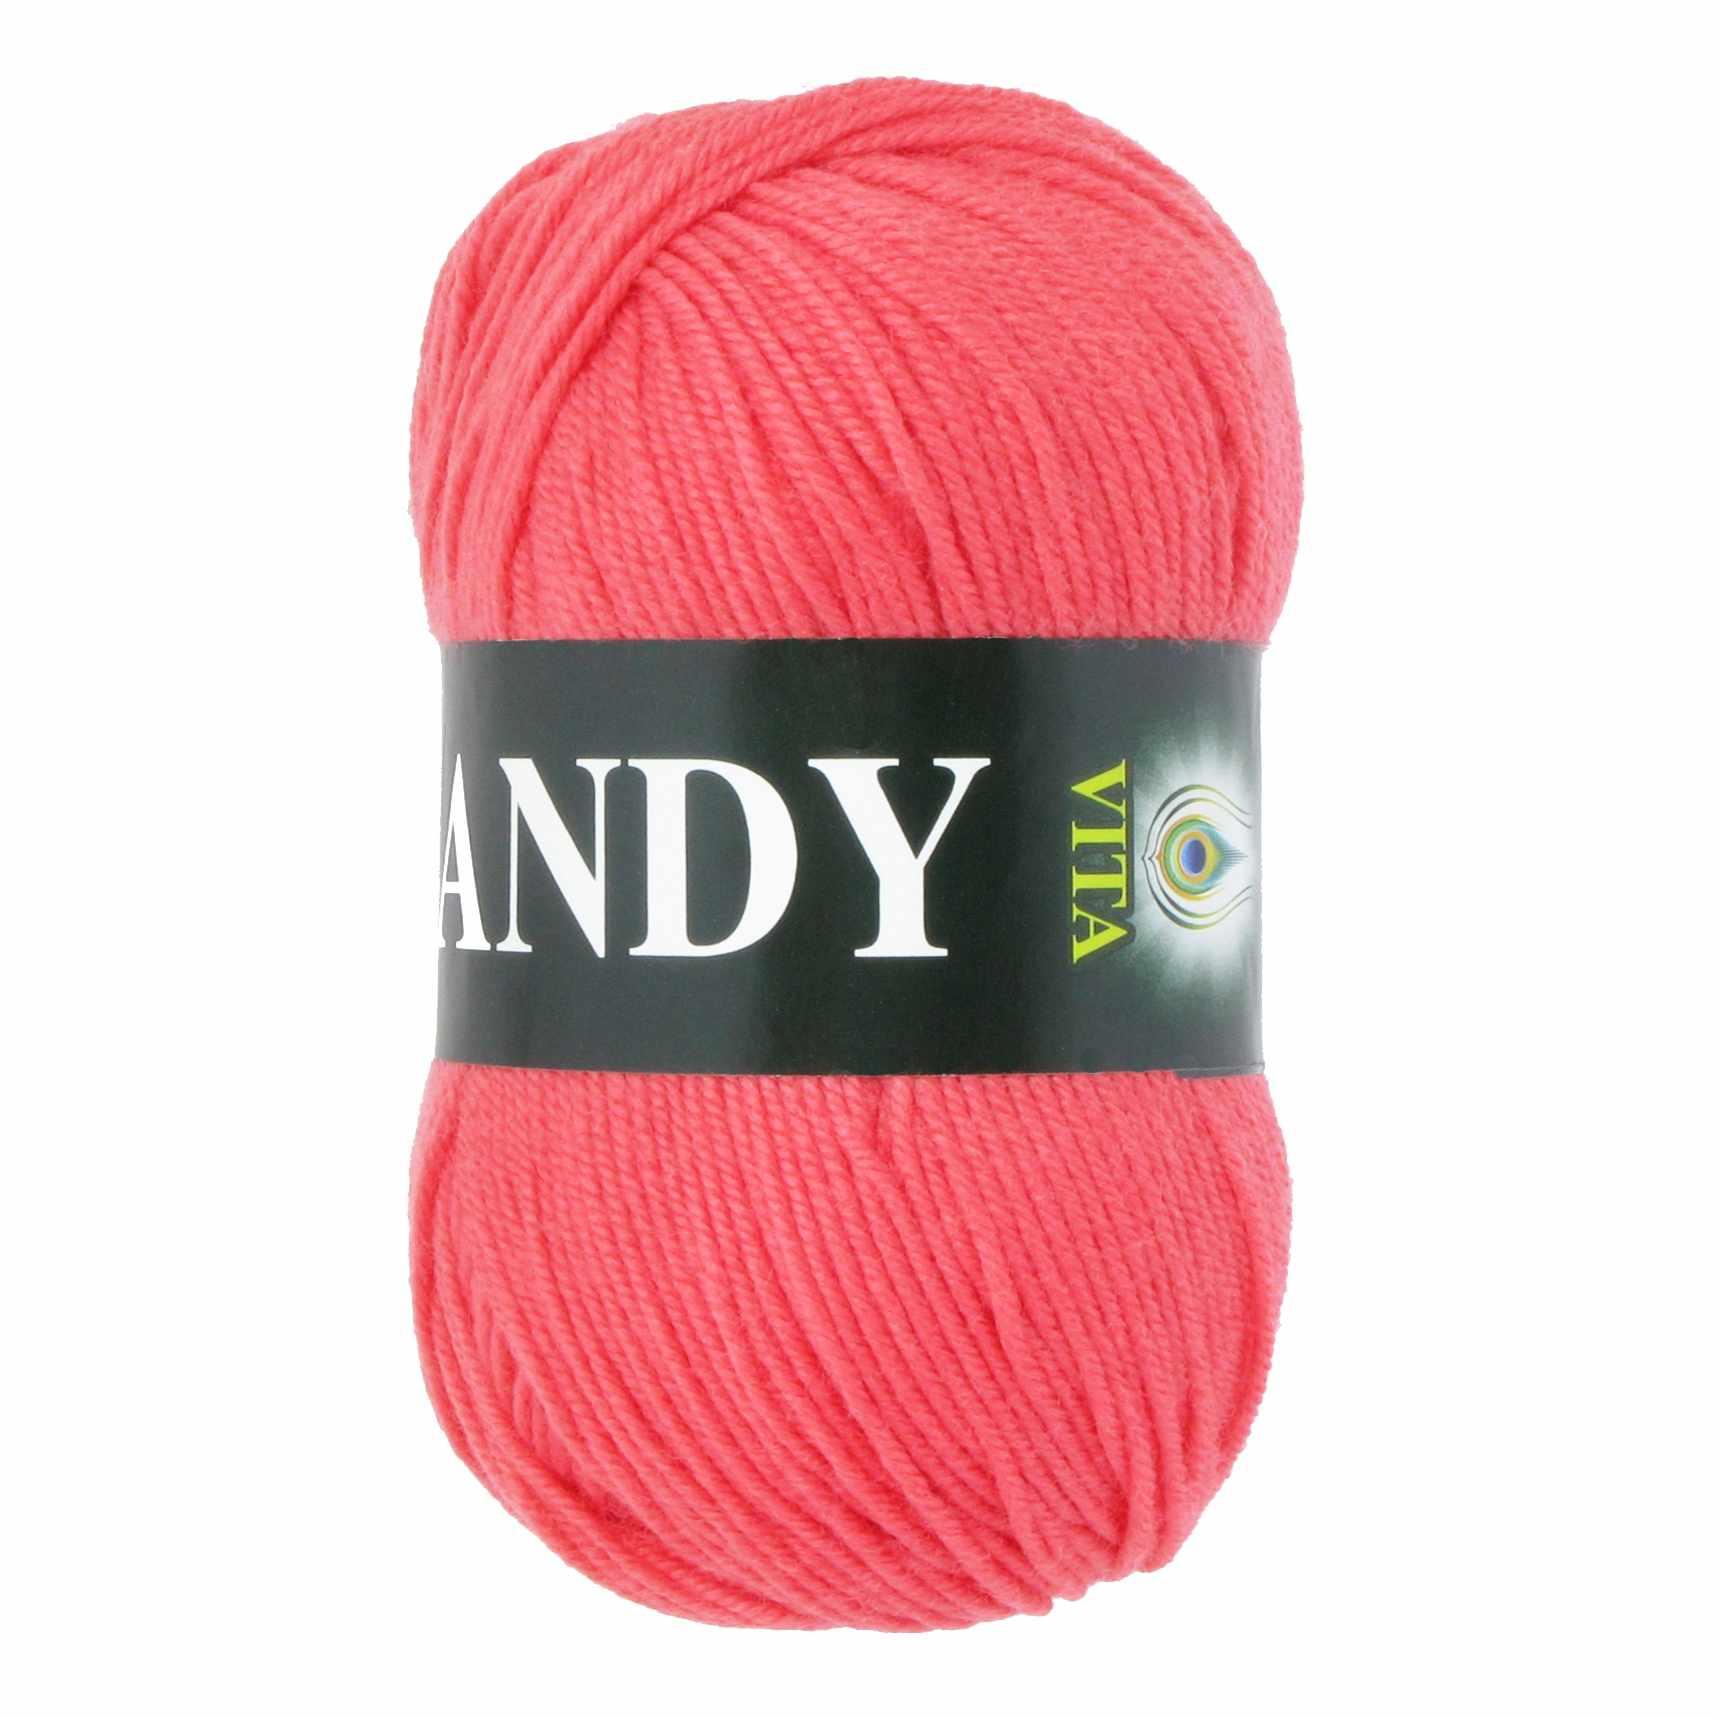 Пряжа VITA Candy Цвет.2520 Коралл